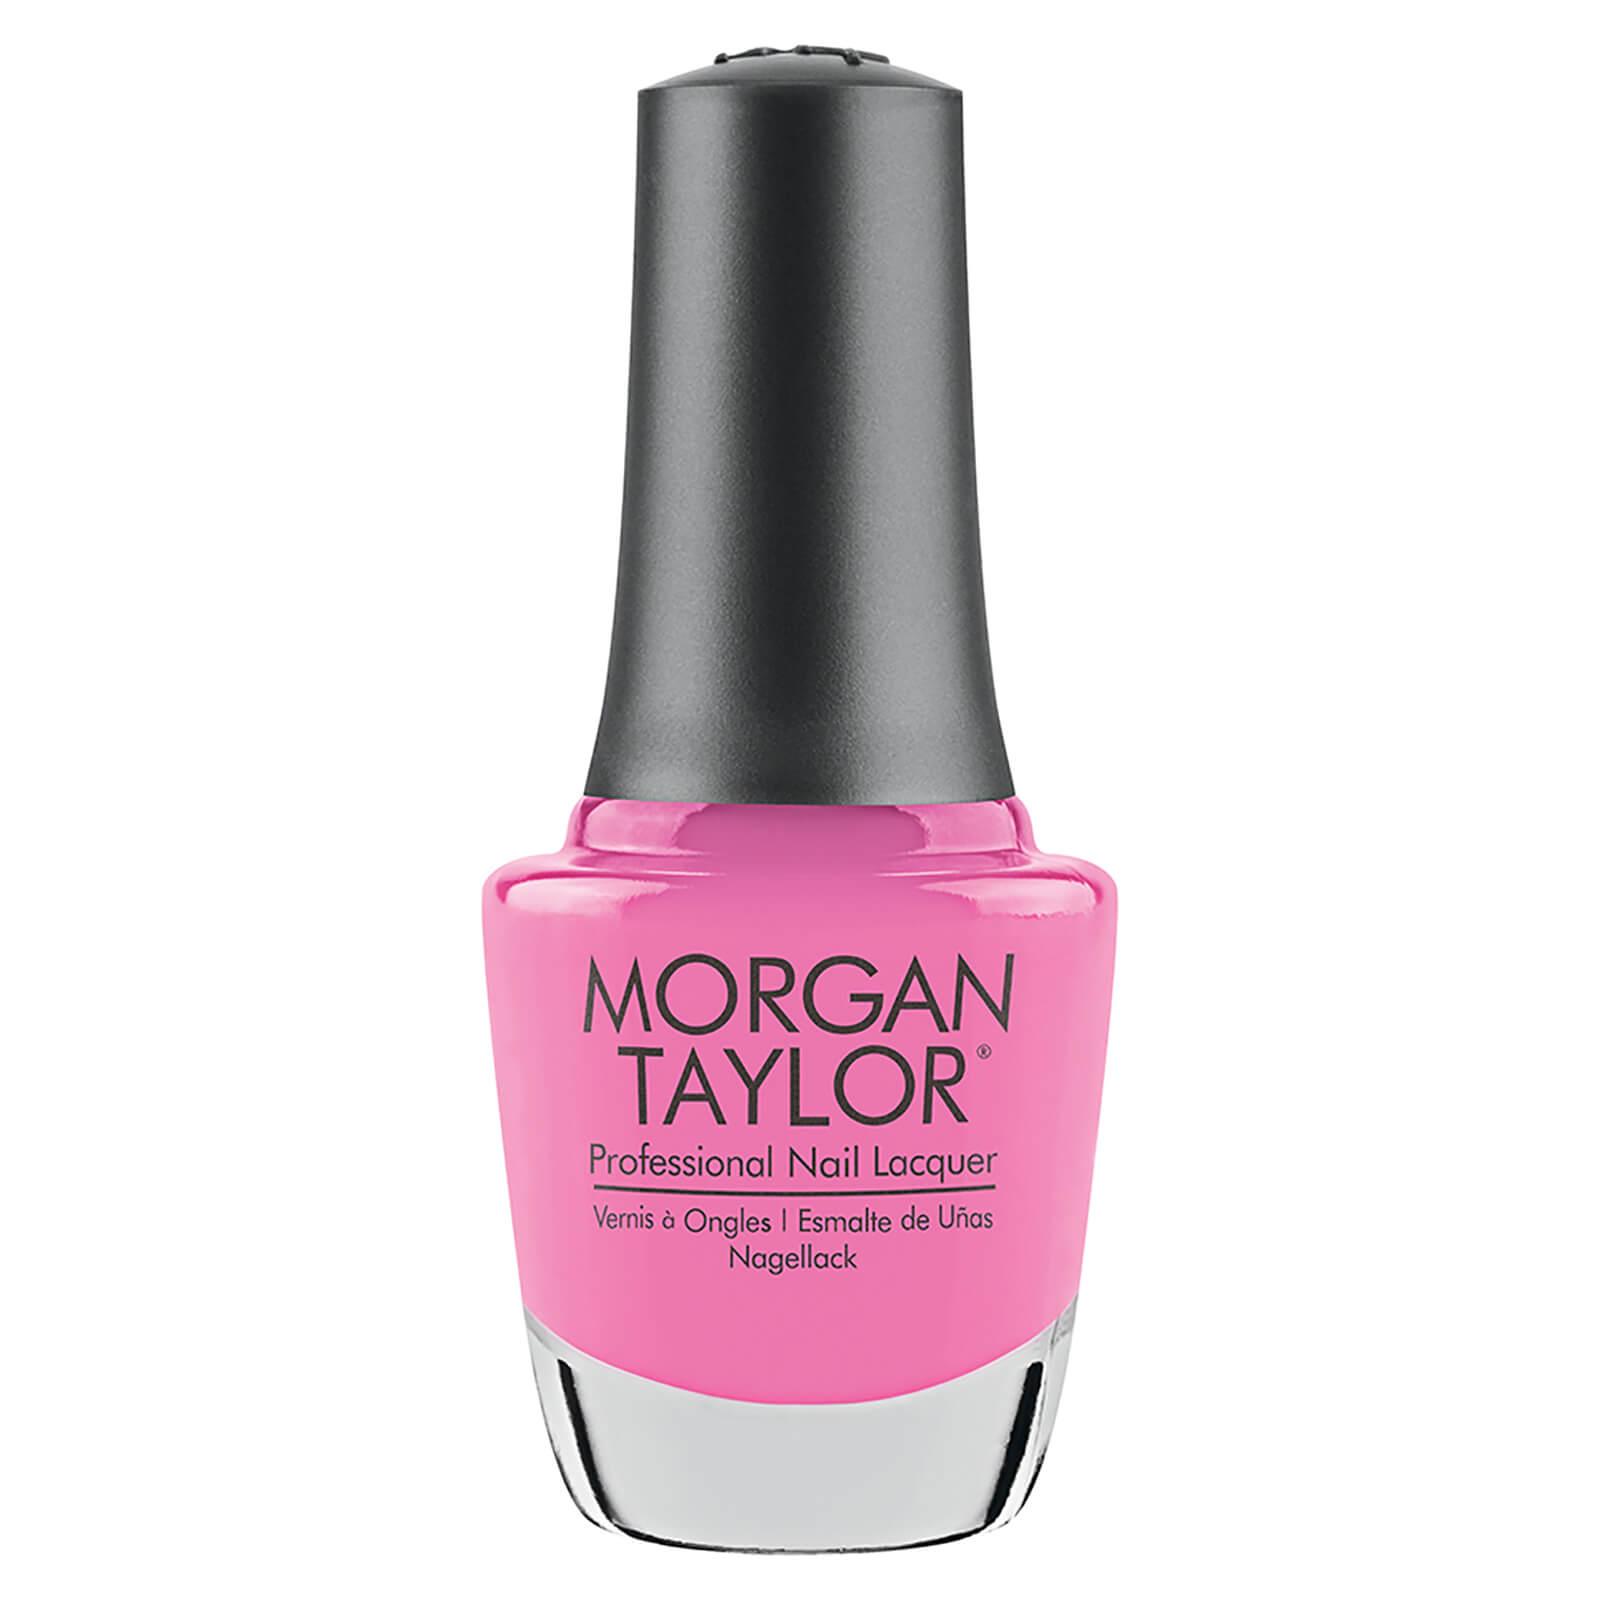 Home Morgan Taylor Professional Nail Lacquer In Lip Service Product Description